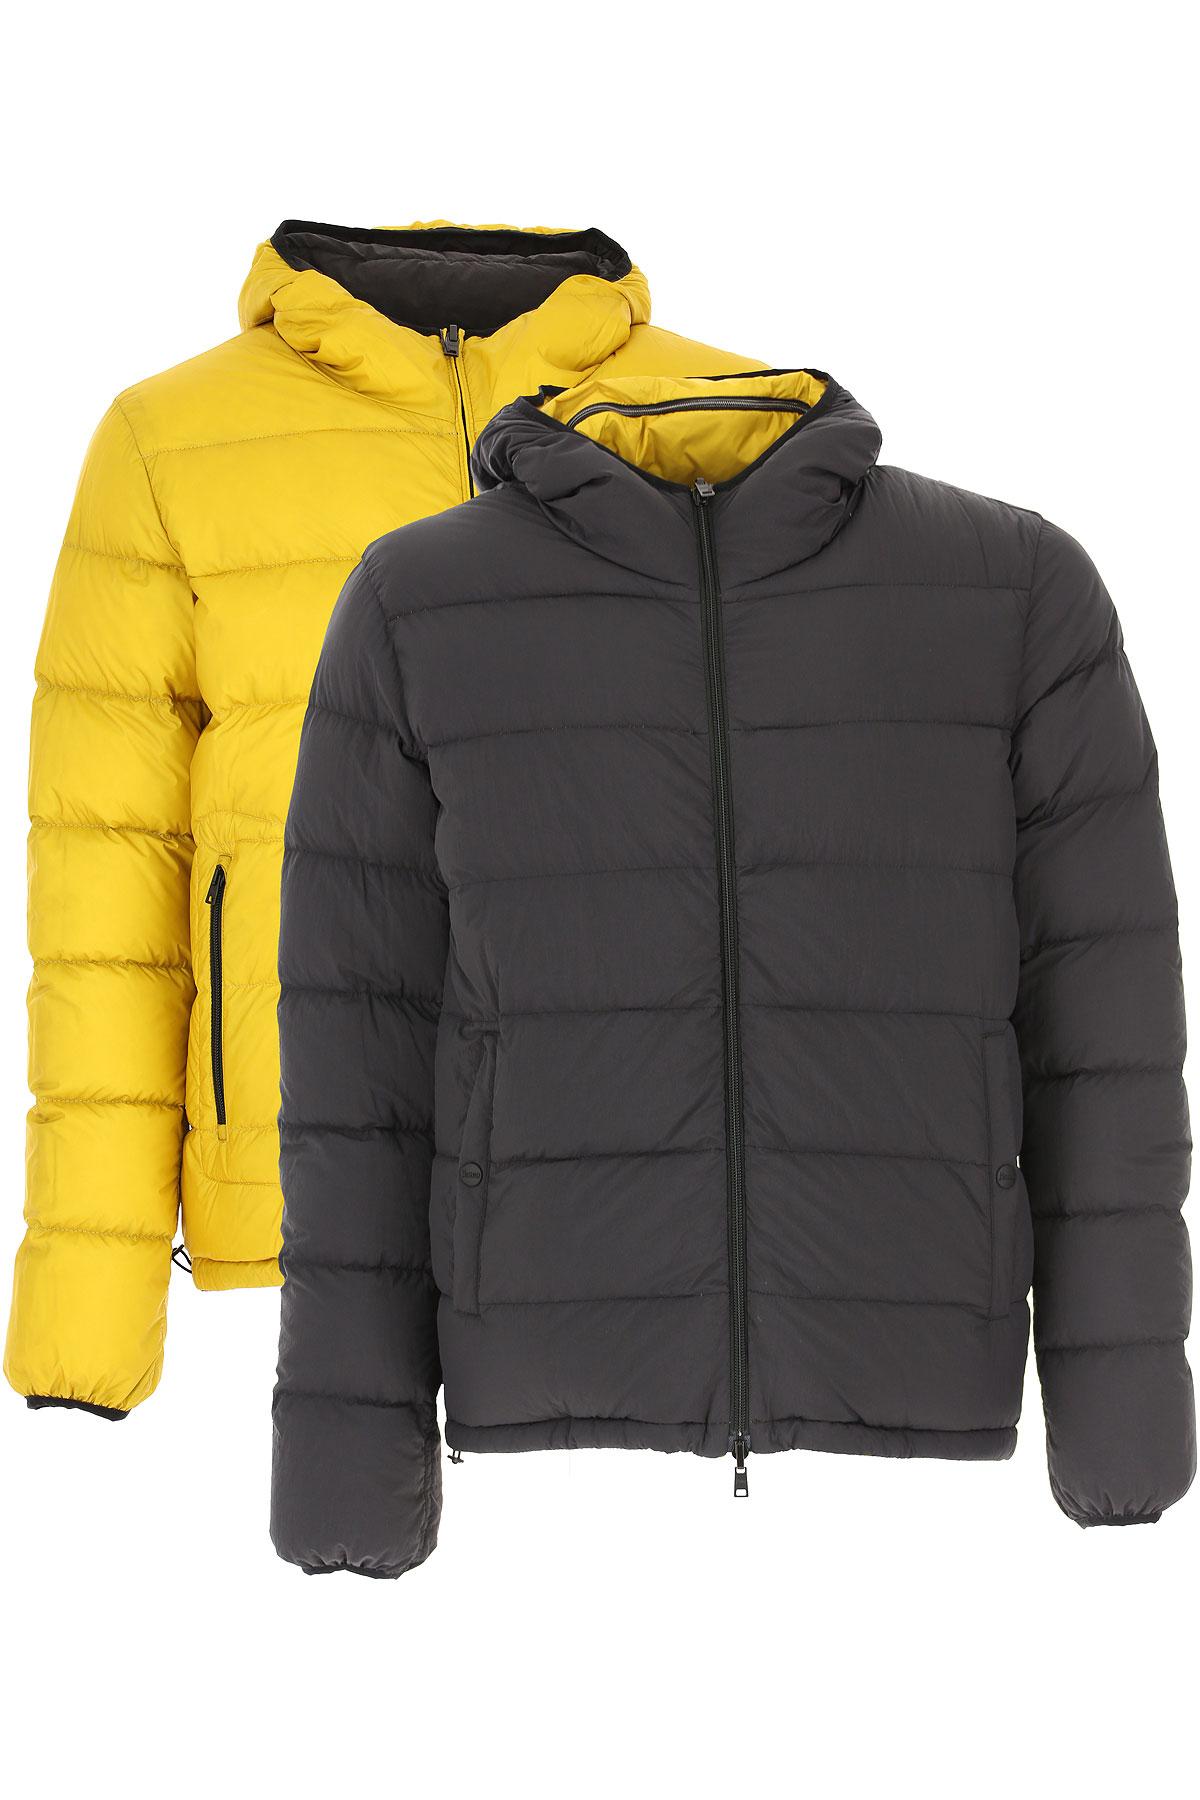 Herno Down Jacket for Men, Puffer Ski Jacket On Sale, Navy Blue, polyamide, 2019, L M XL